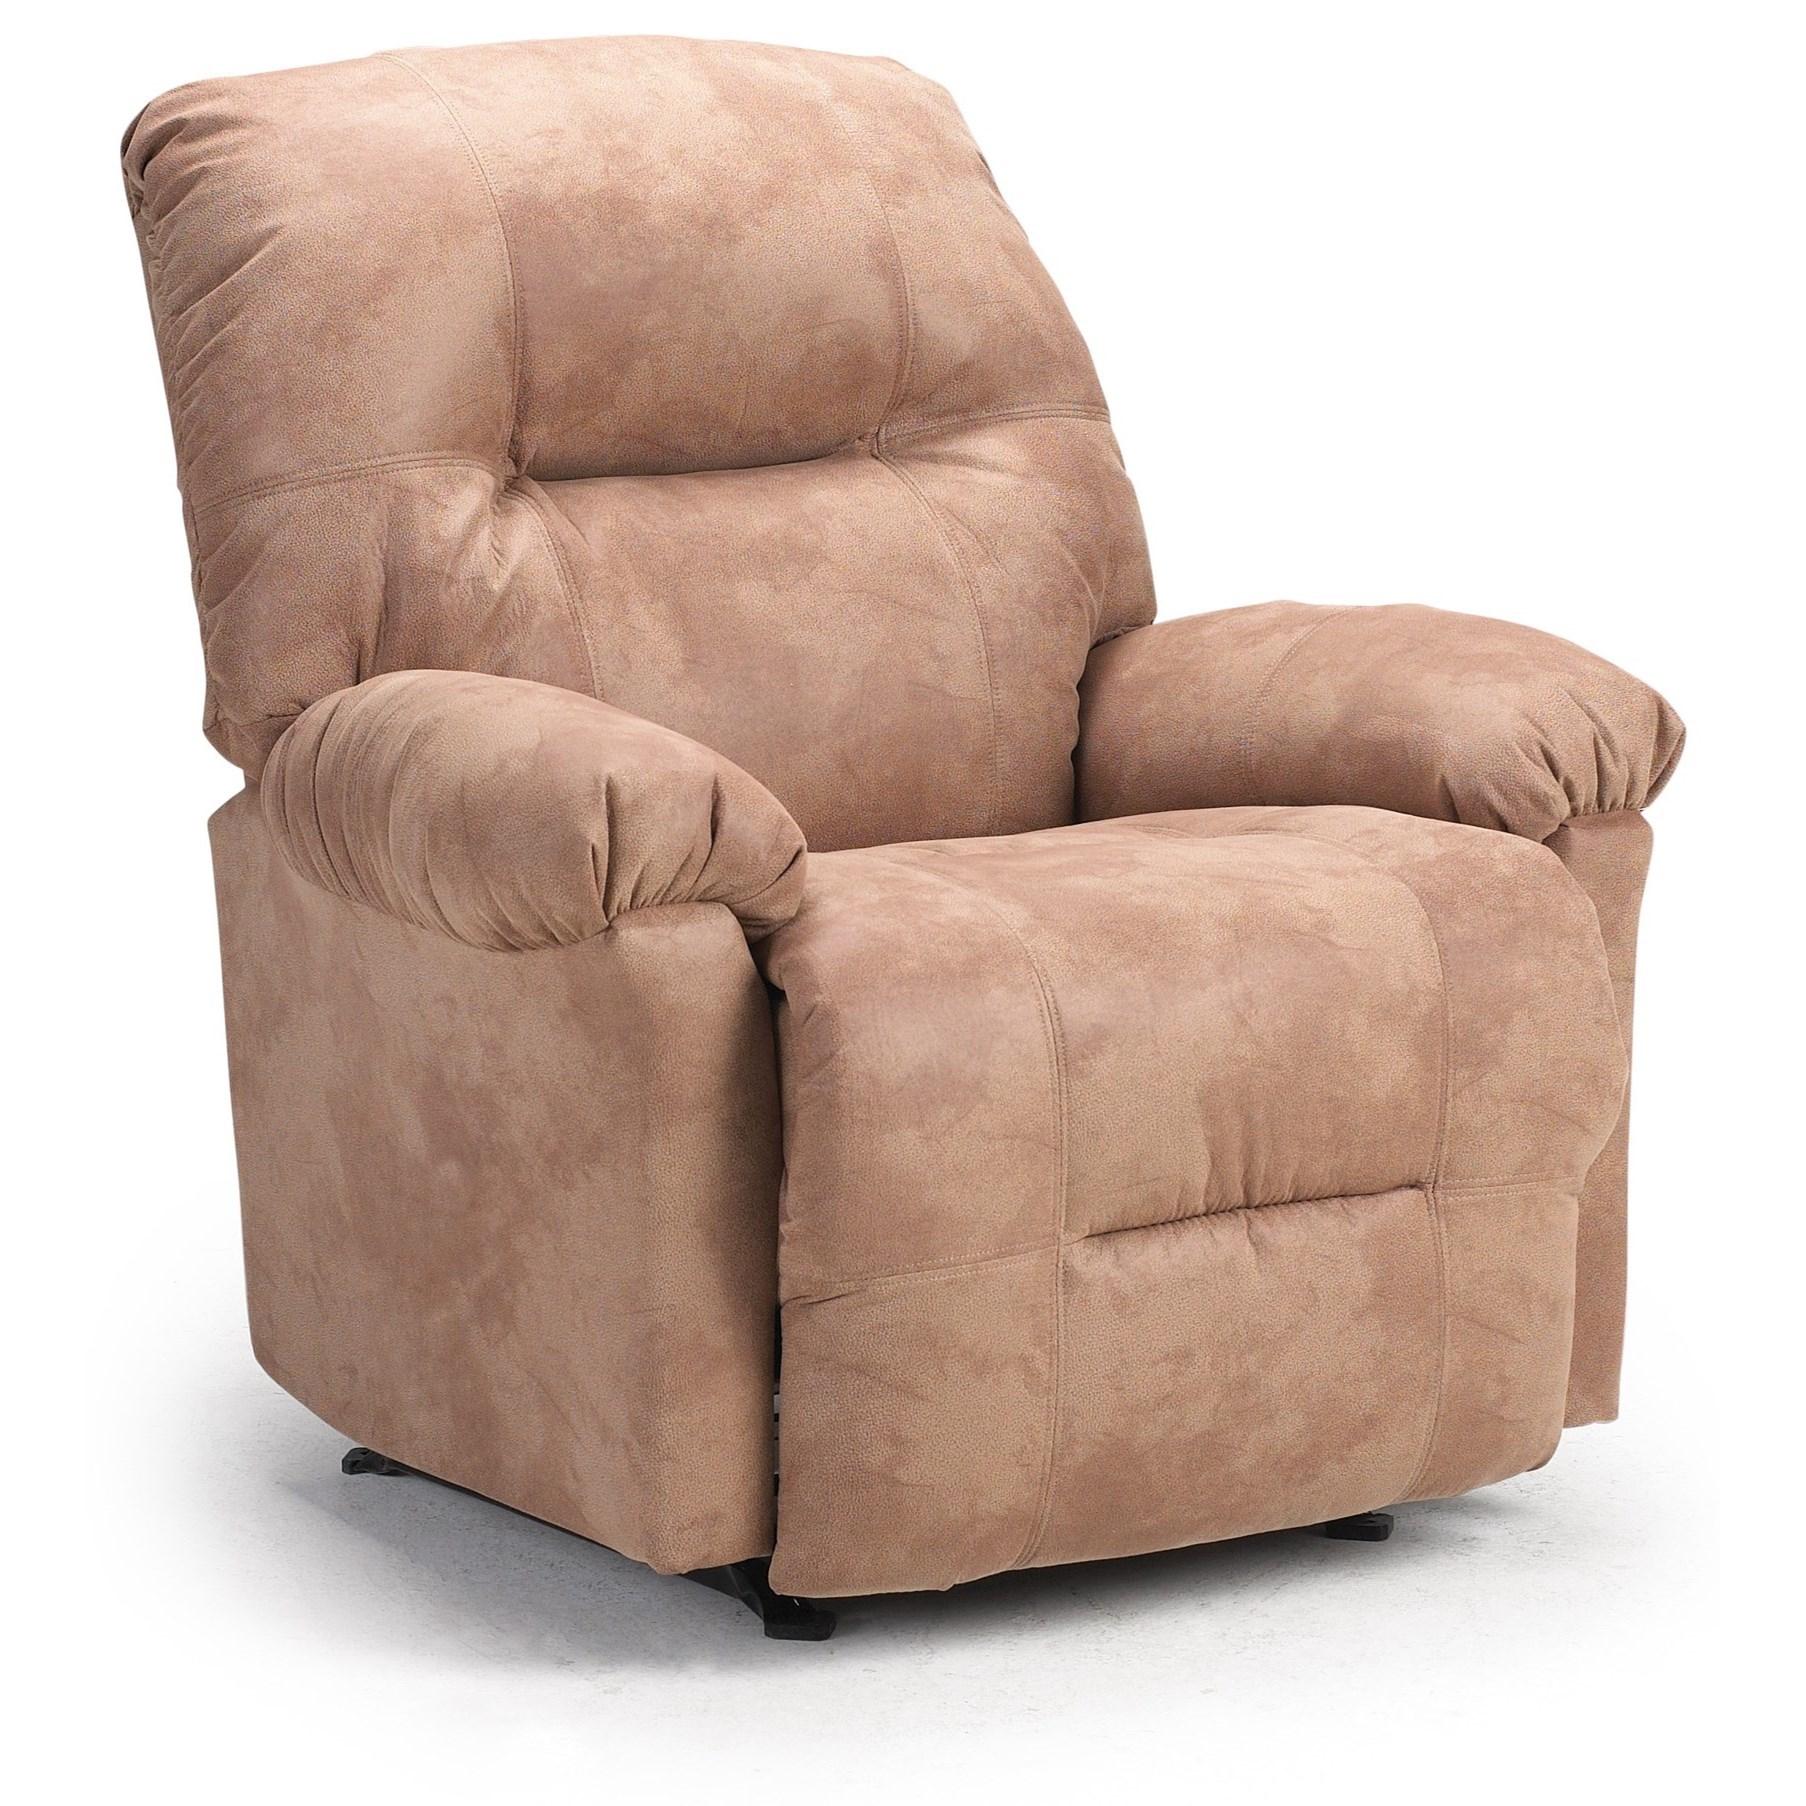 Wynette Power Rocking Reclining Chair